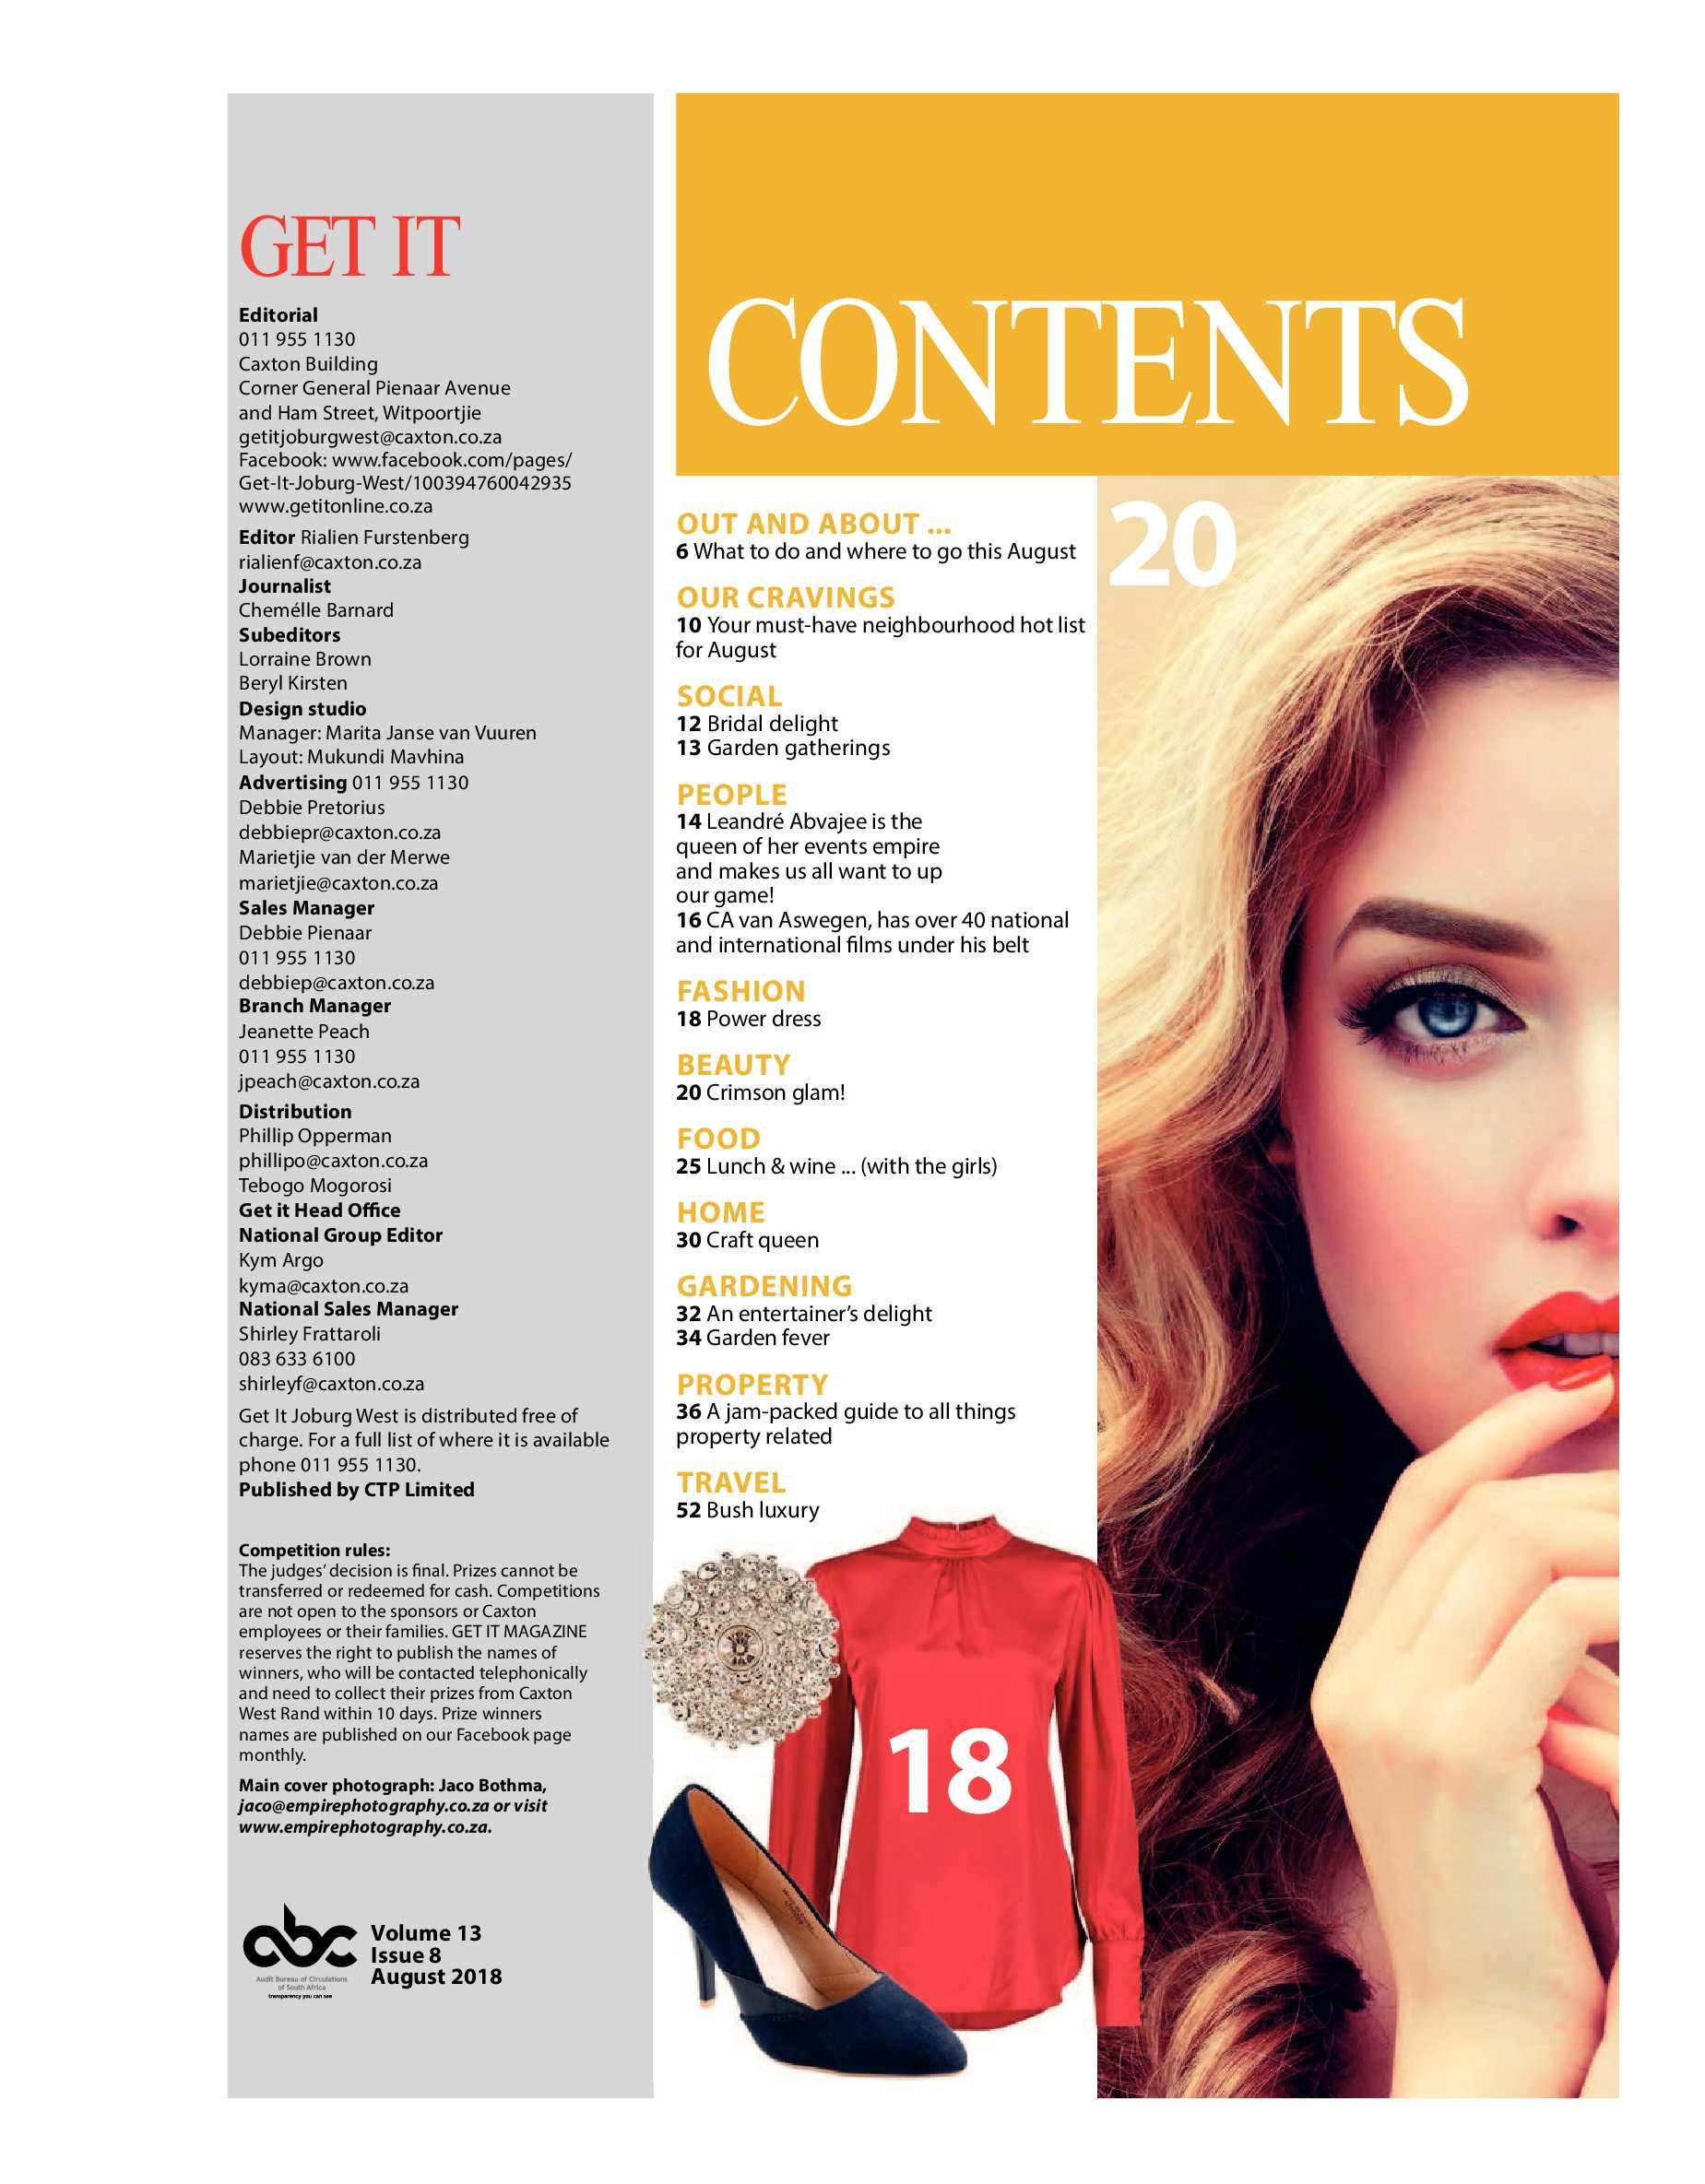 getit-joburg-west-august-2018-epapers-page-5